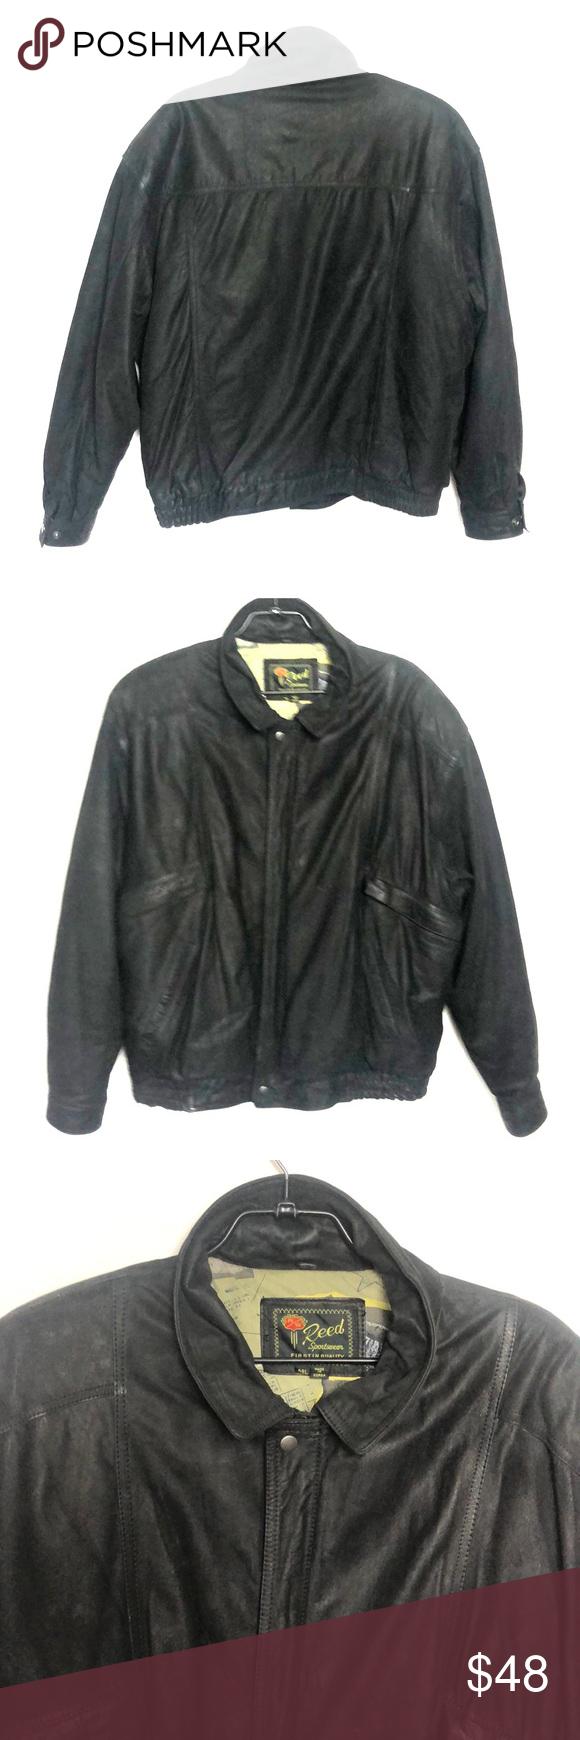 Vtg Reed Sportswear Leather Jacket 48l Bomber Leather Jacket Sportswear Jackets [ 1740 x 580 Pixel ]